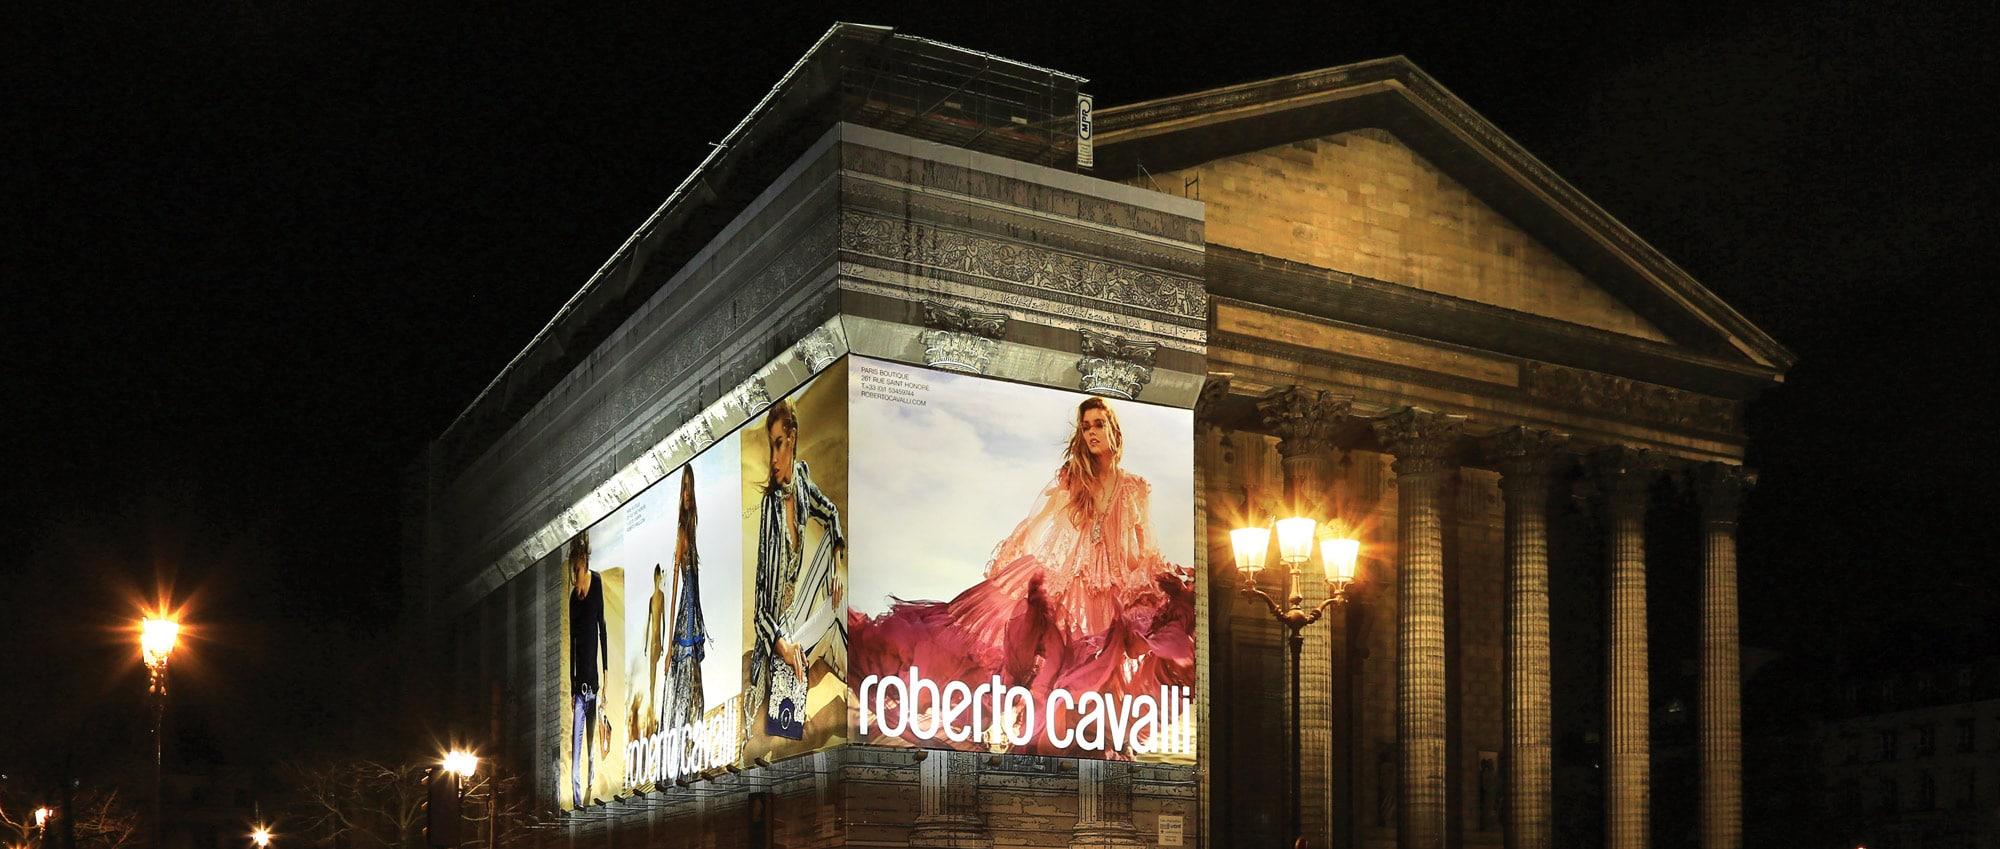 Publicité monumentale La Madeleine Roberto Cavalli